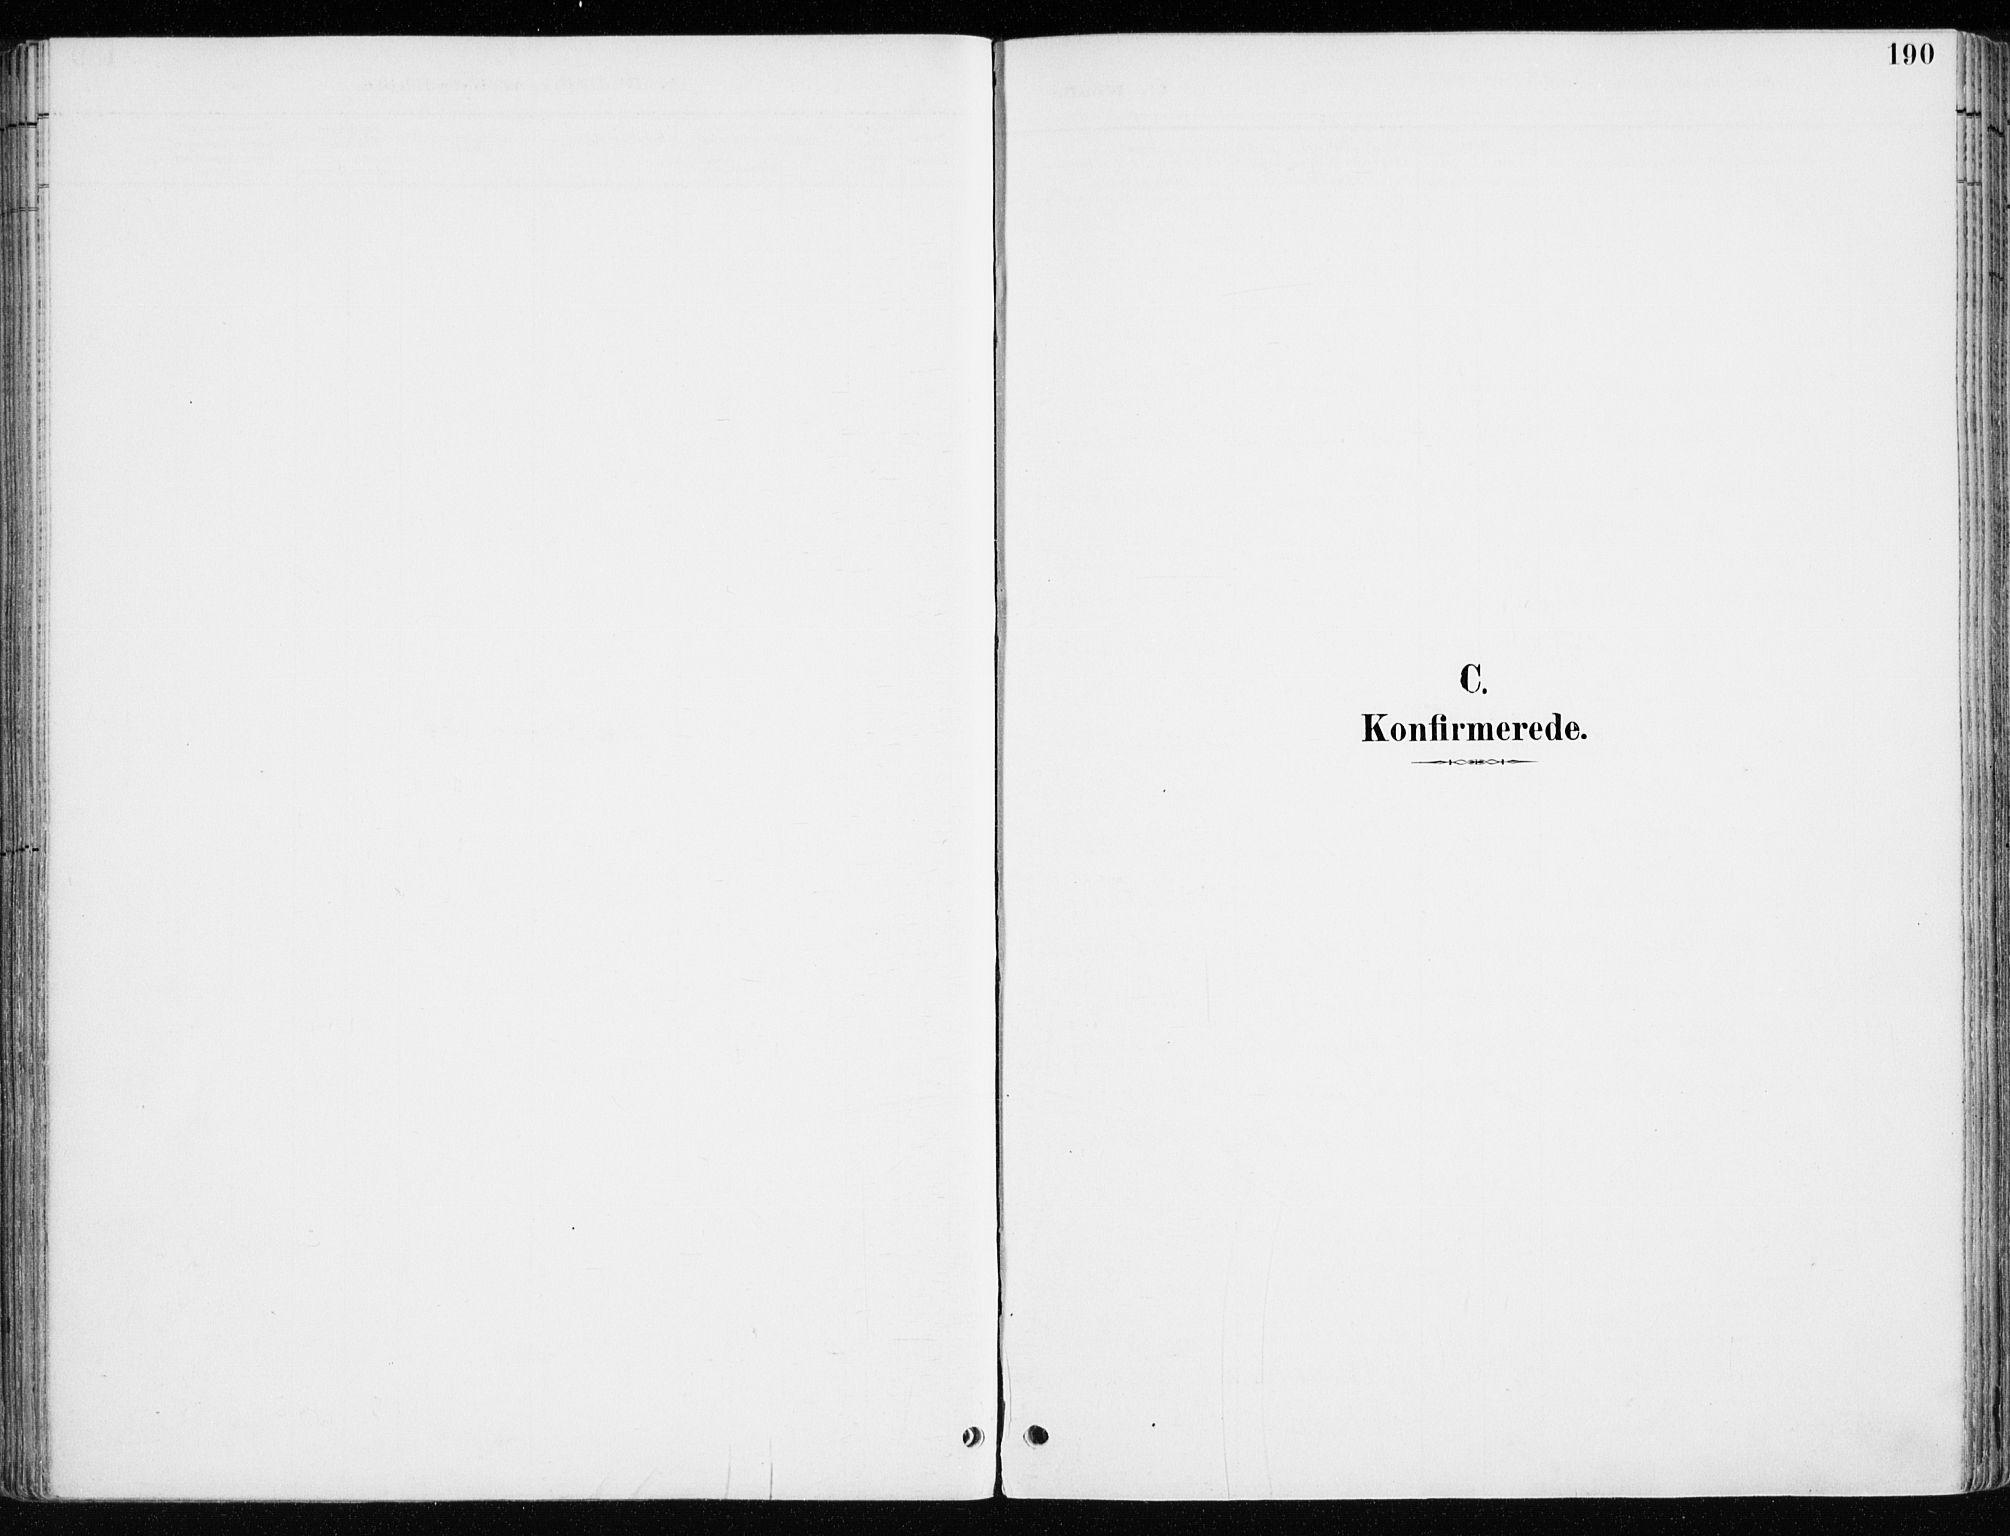 SAH, Løten prestekontor, K/Ka/L0010: Ministerialbok nr. 10, 1892-1907, s. 190